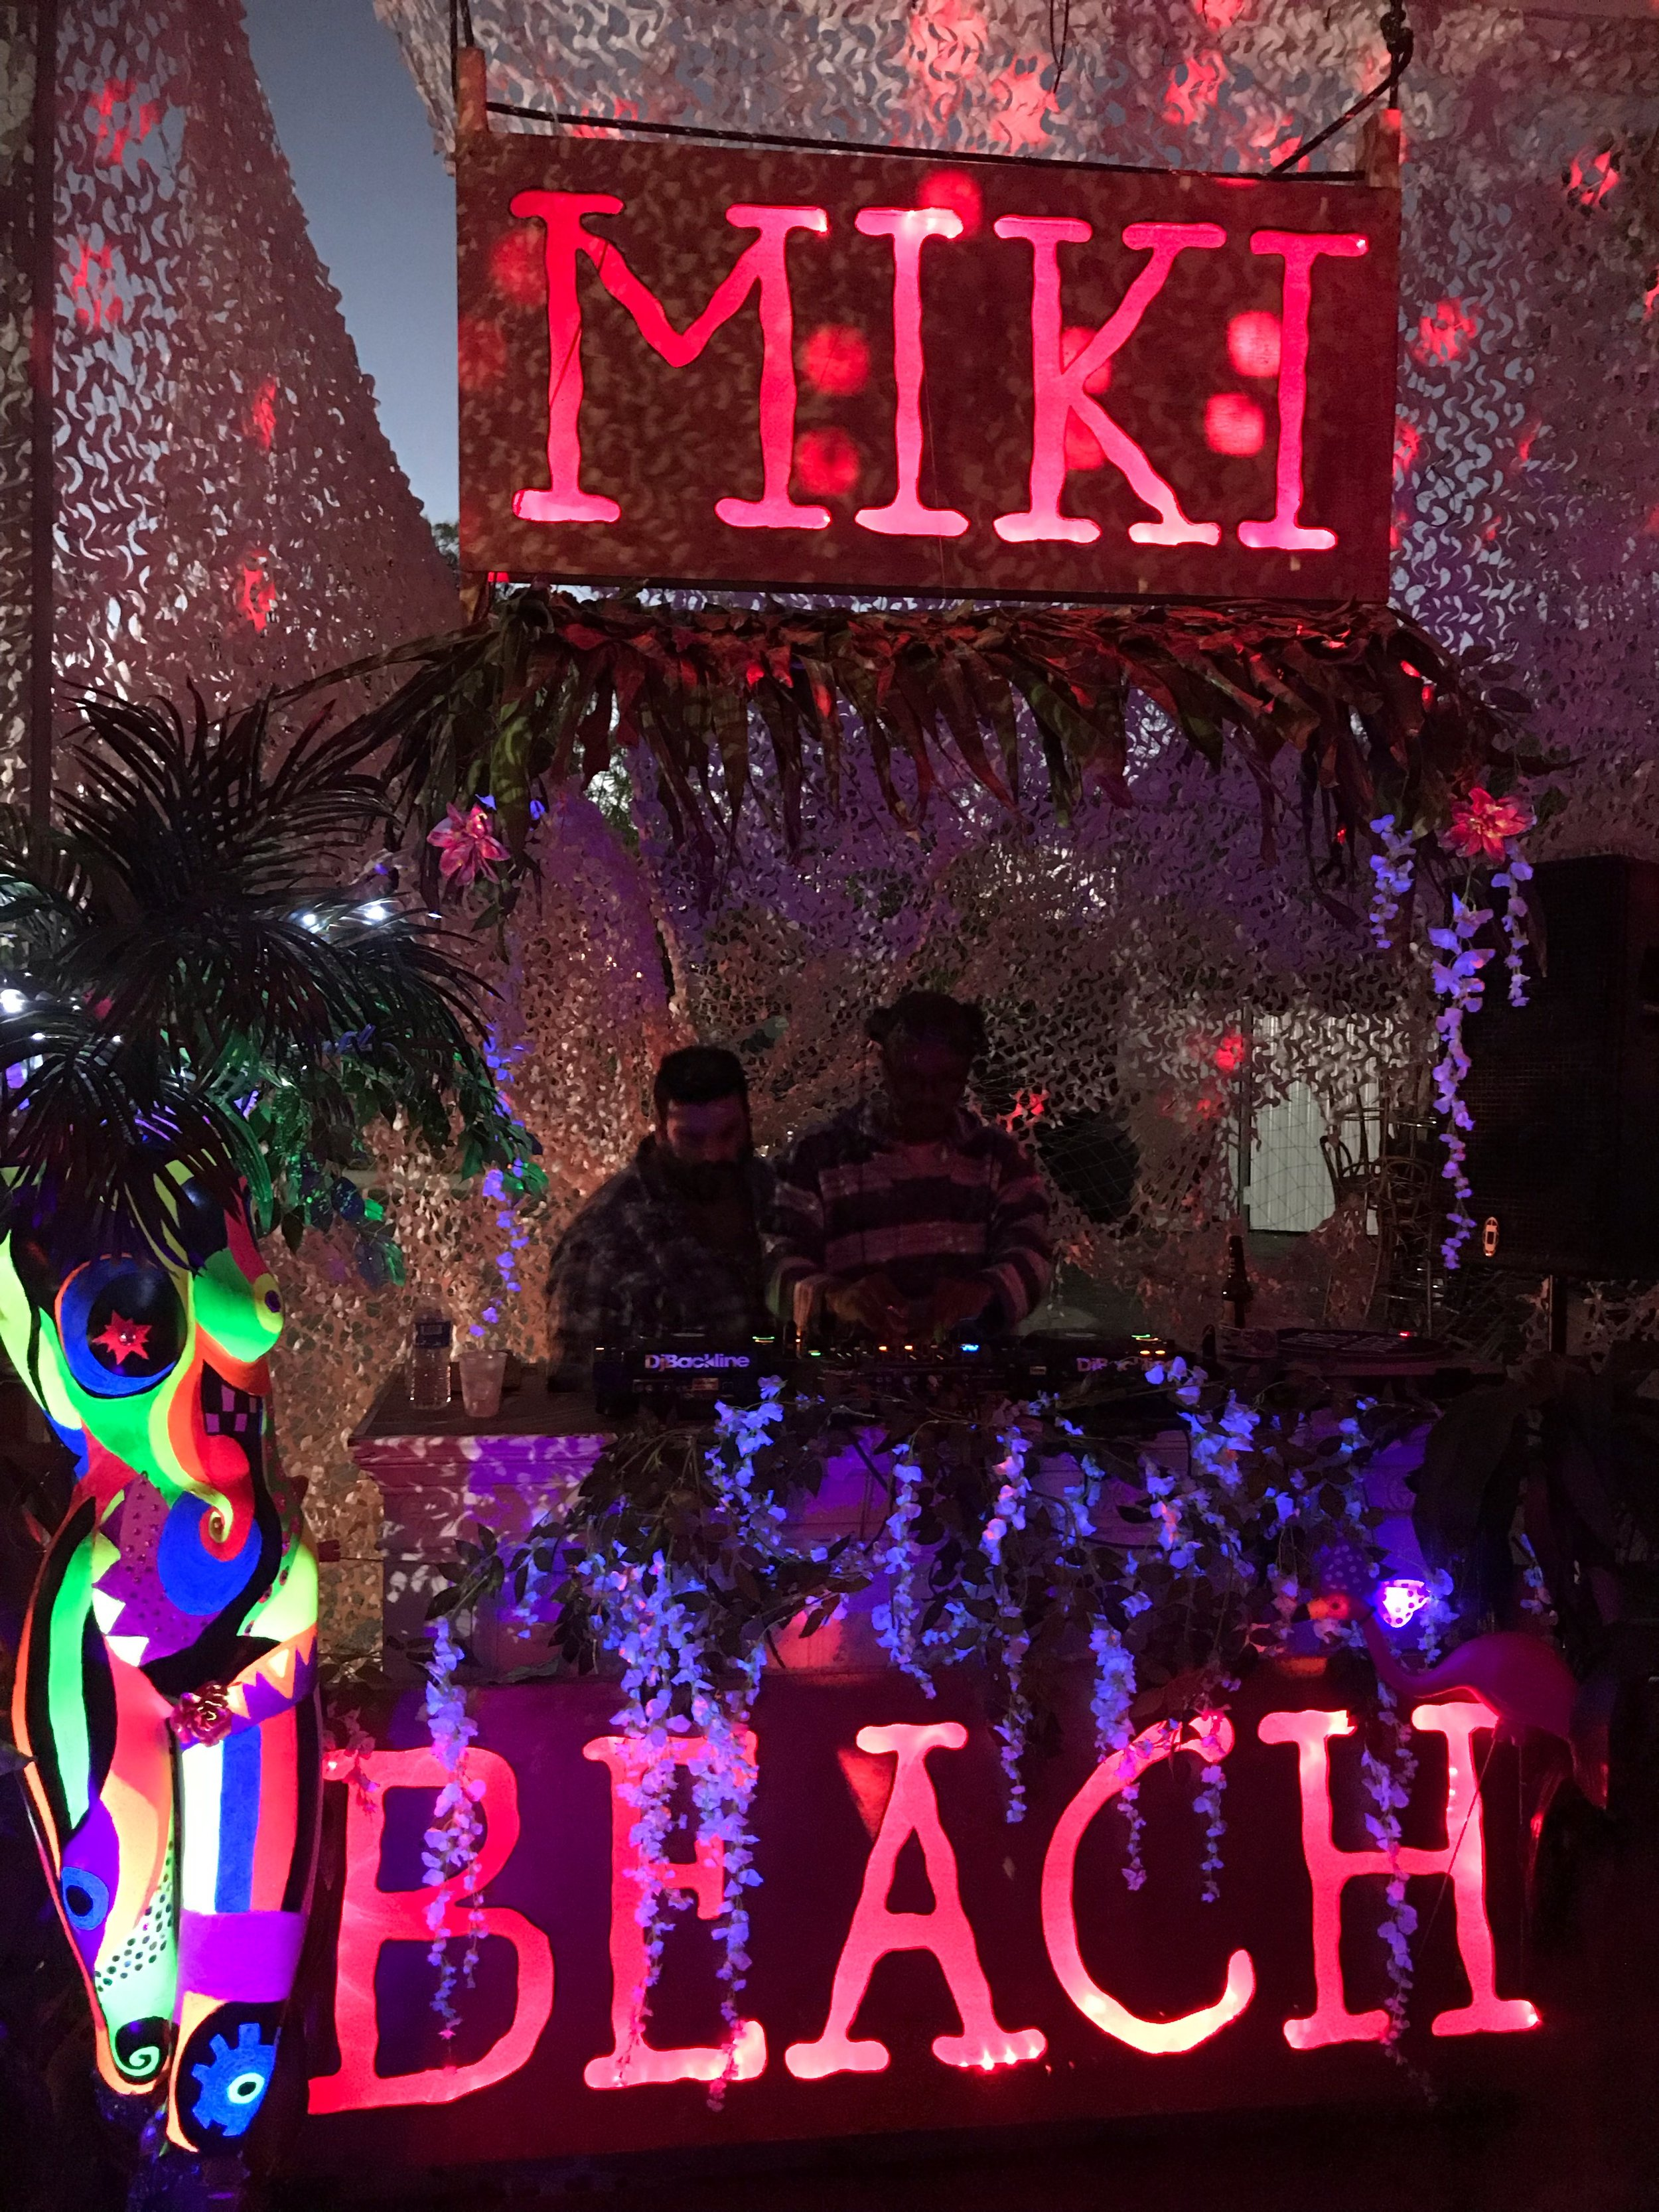 miki beach art basel 2018 florum fashion magazine burning man tara brooks